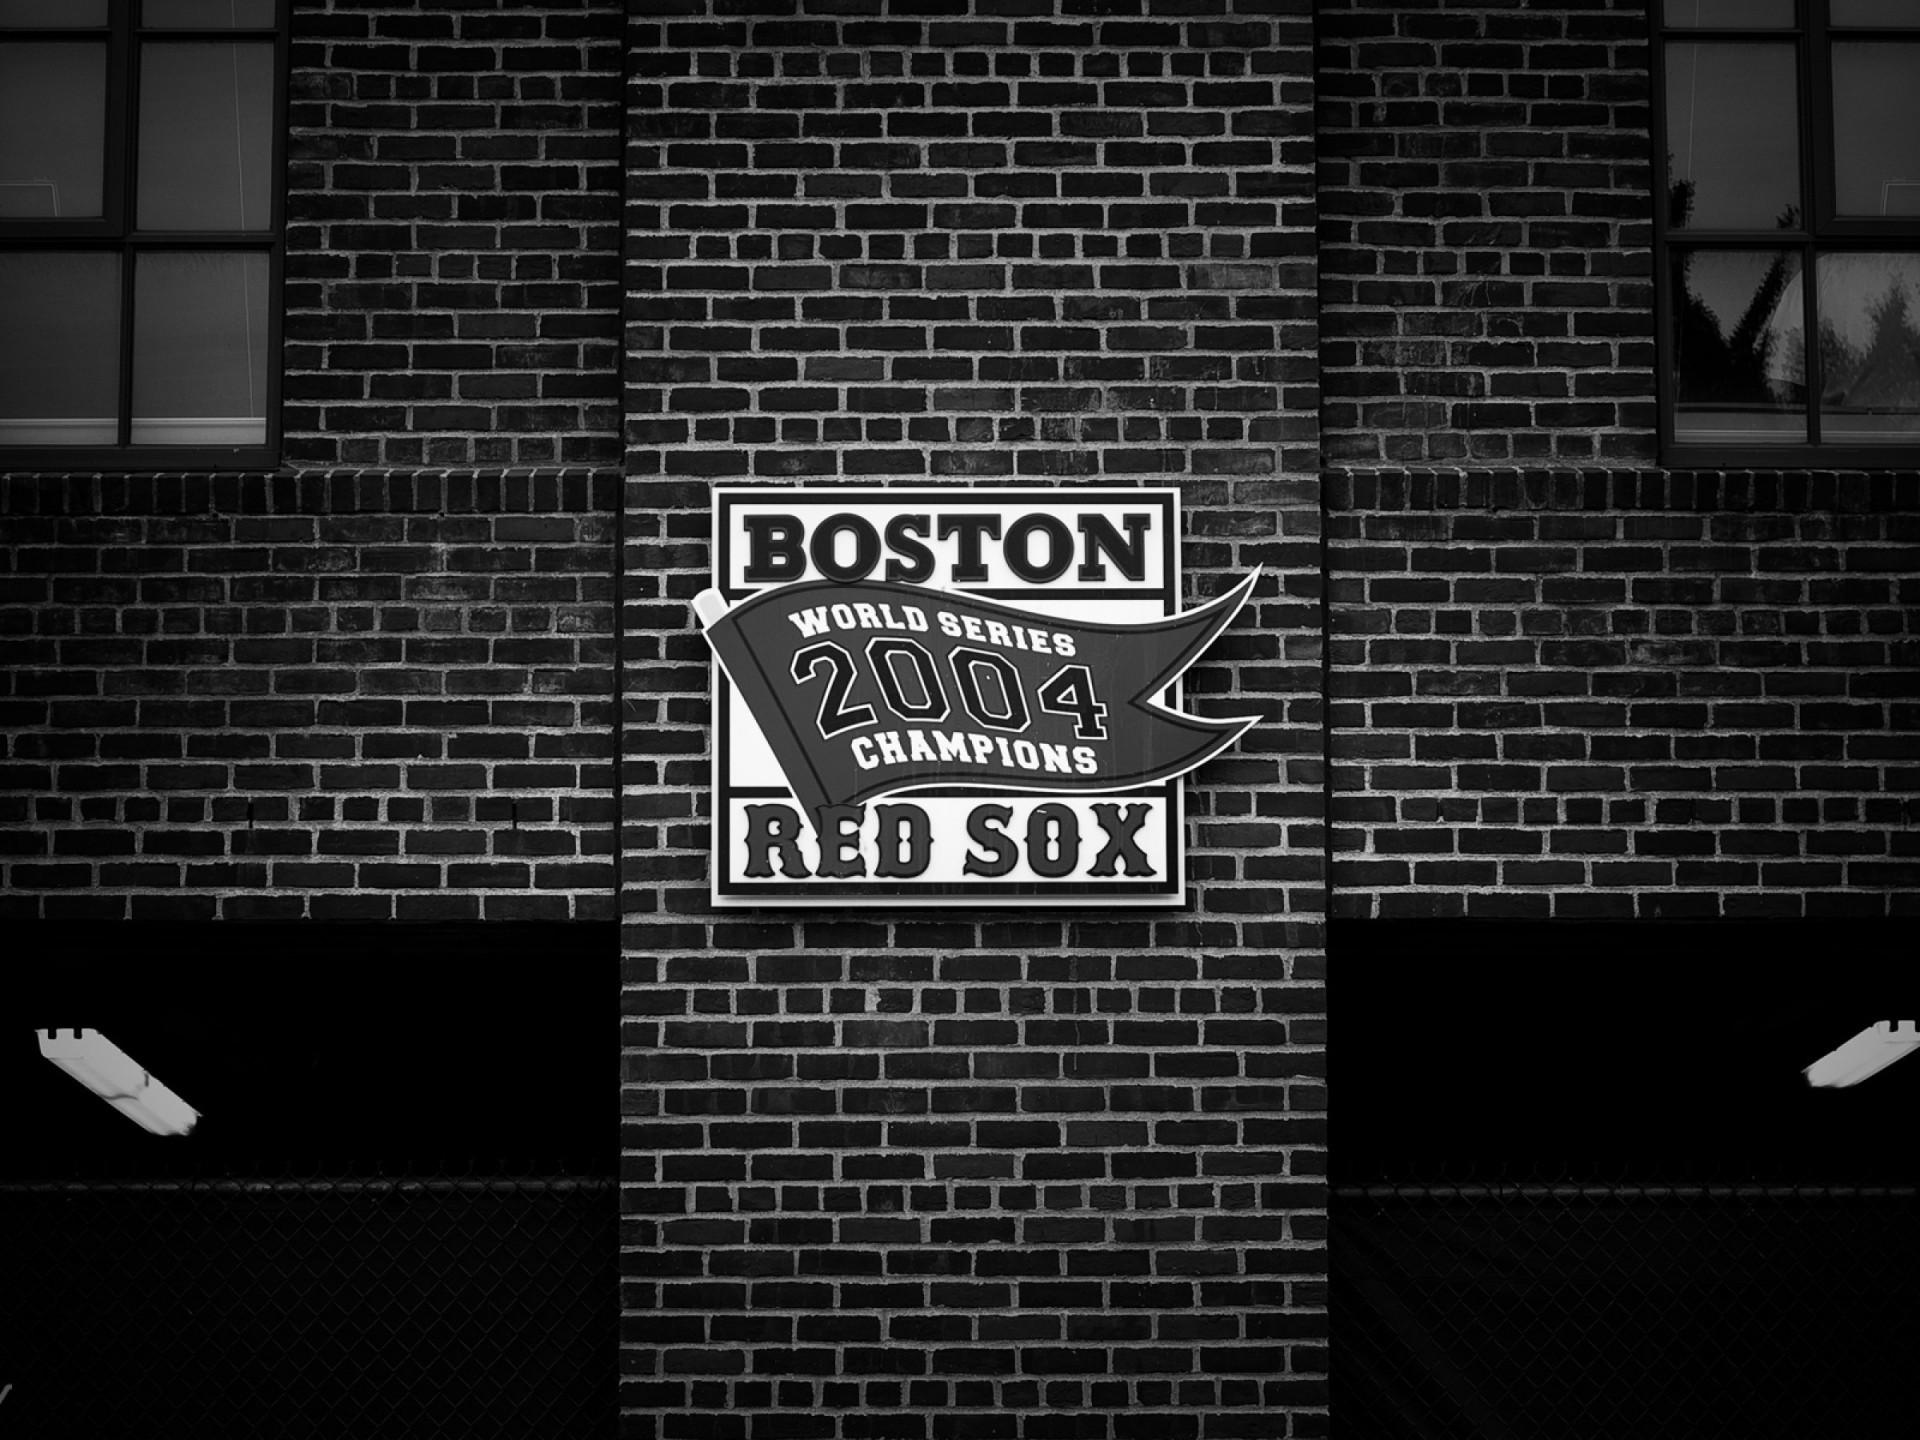 Boston Red Sox Ipad Wallpaper, Size: #559 | AmazingPict.com